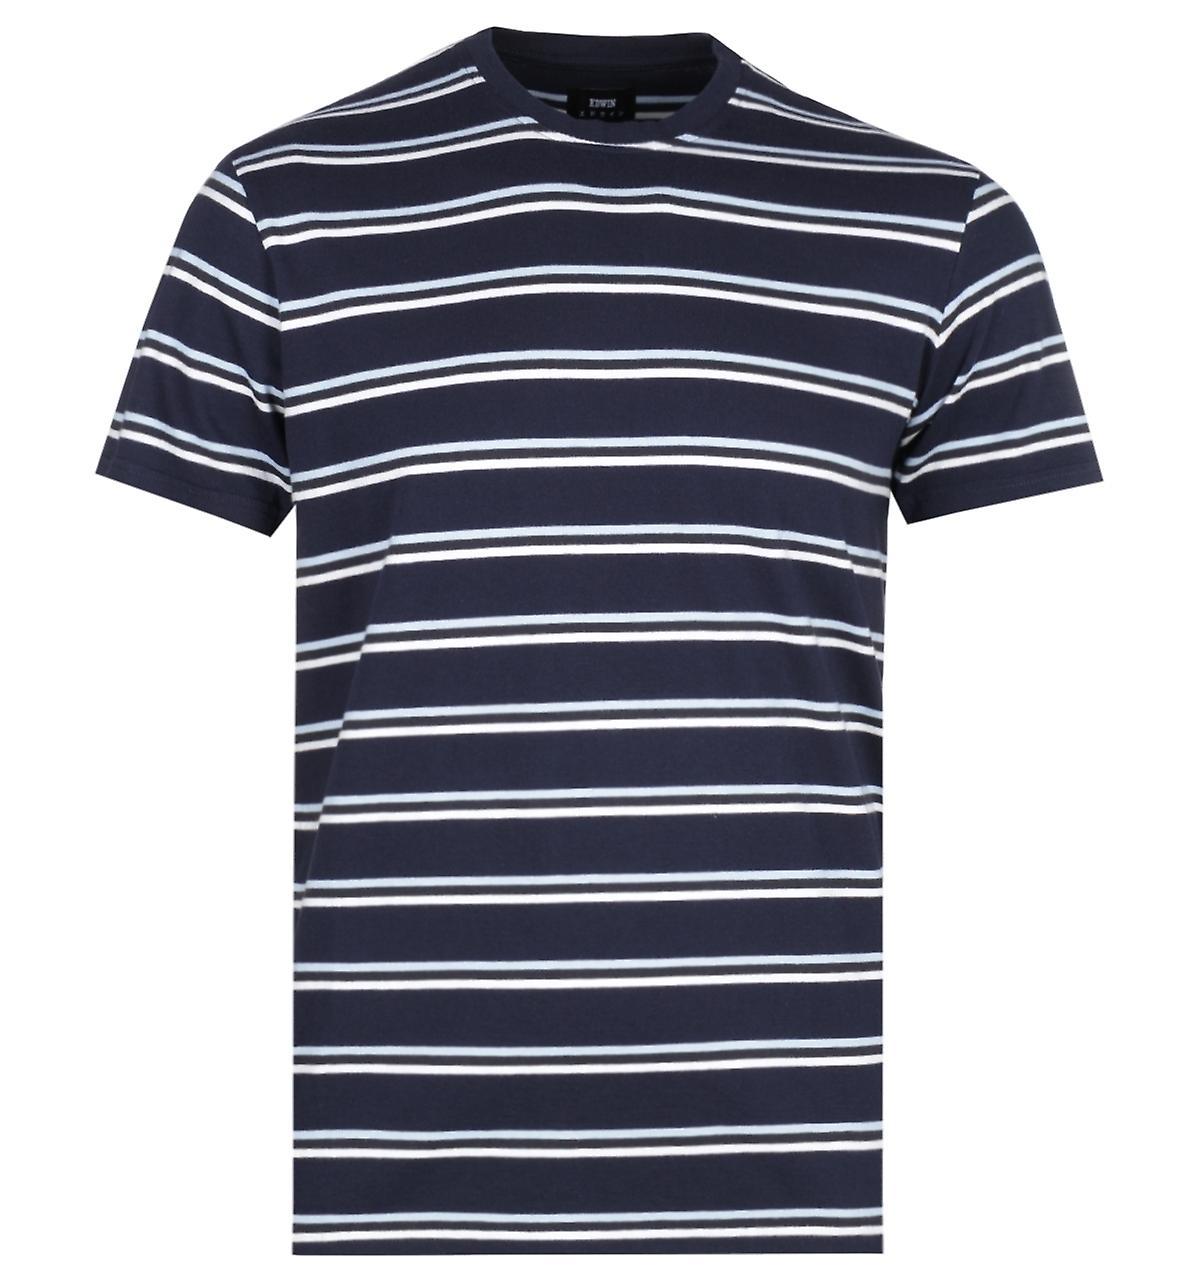 Edwin West Stripes Navy T-Shirt